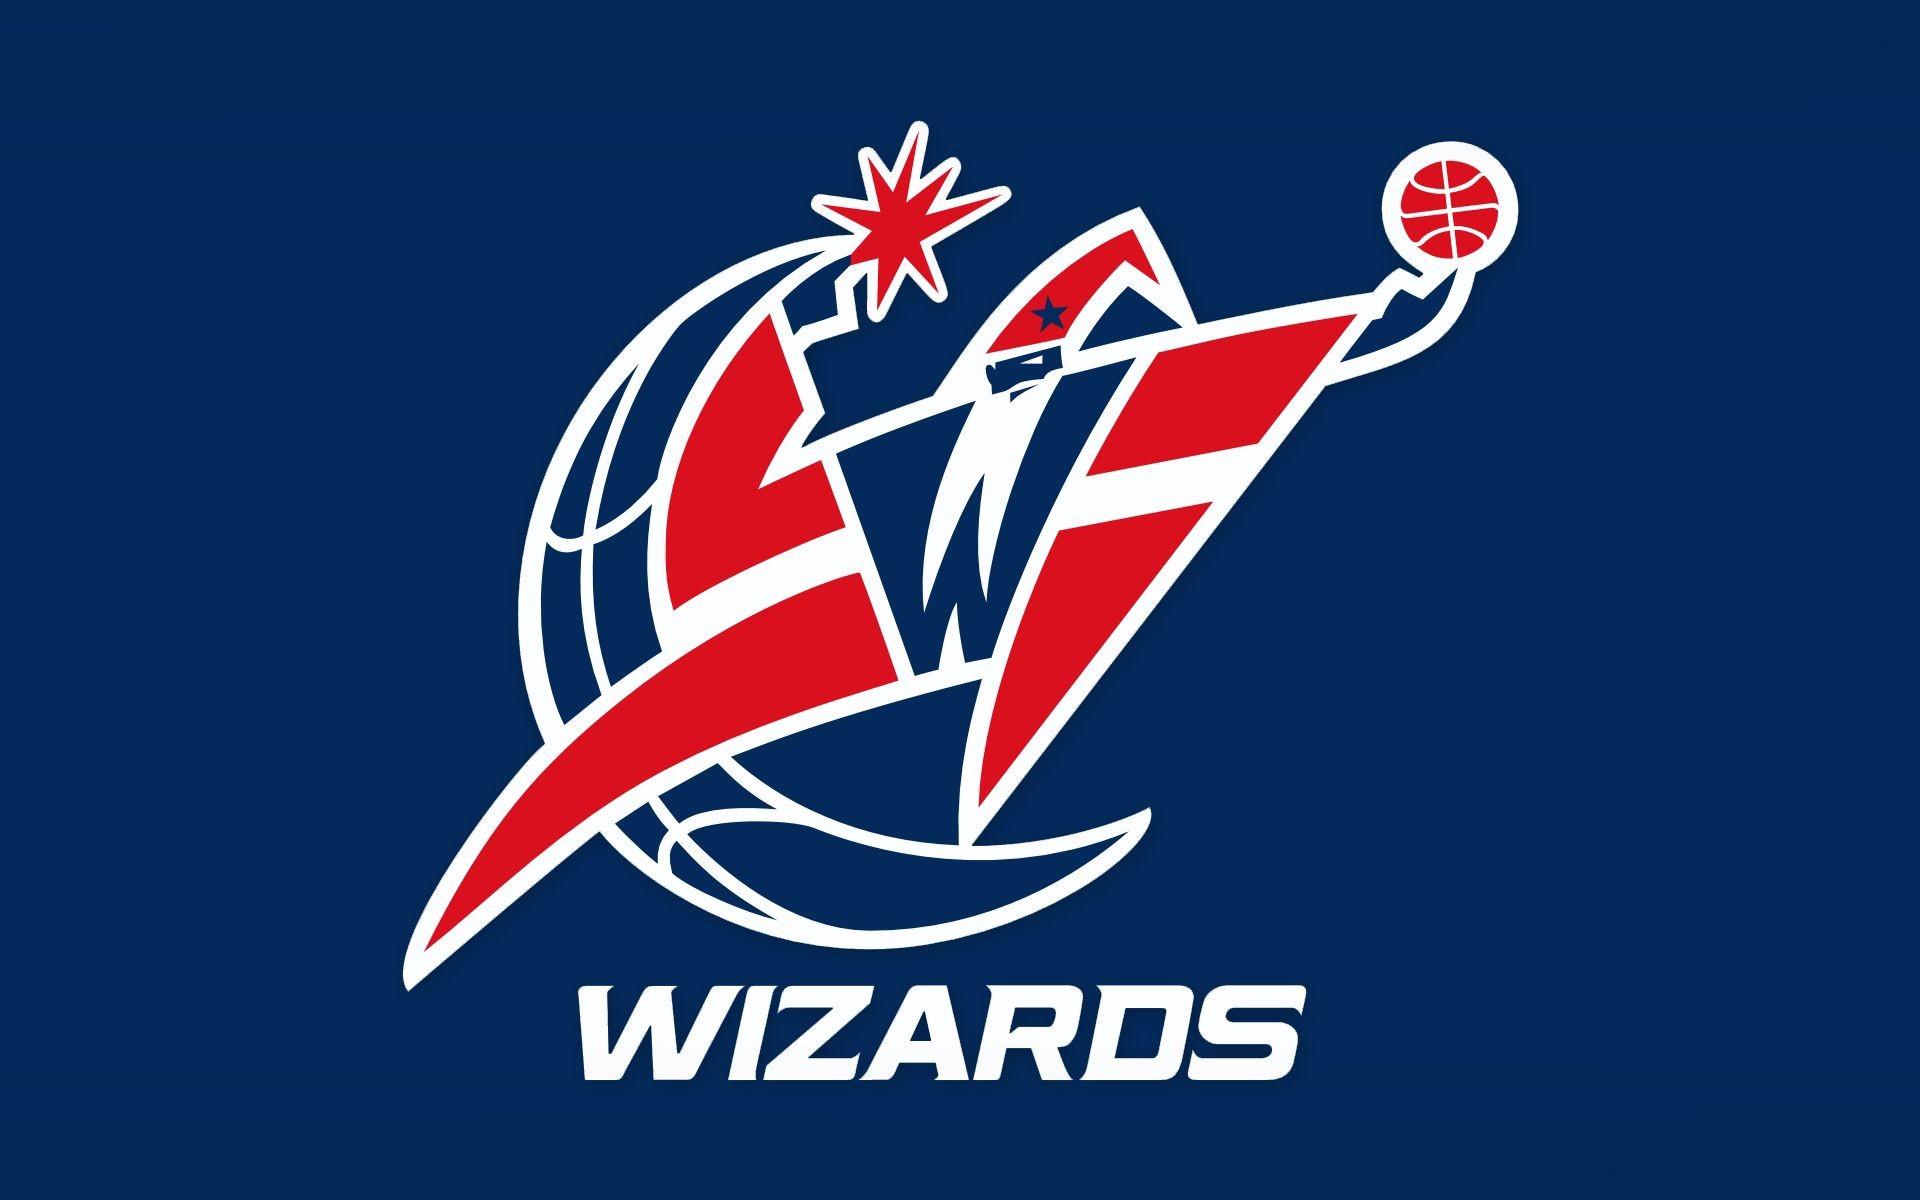 Washington Wizards Wallpaper